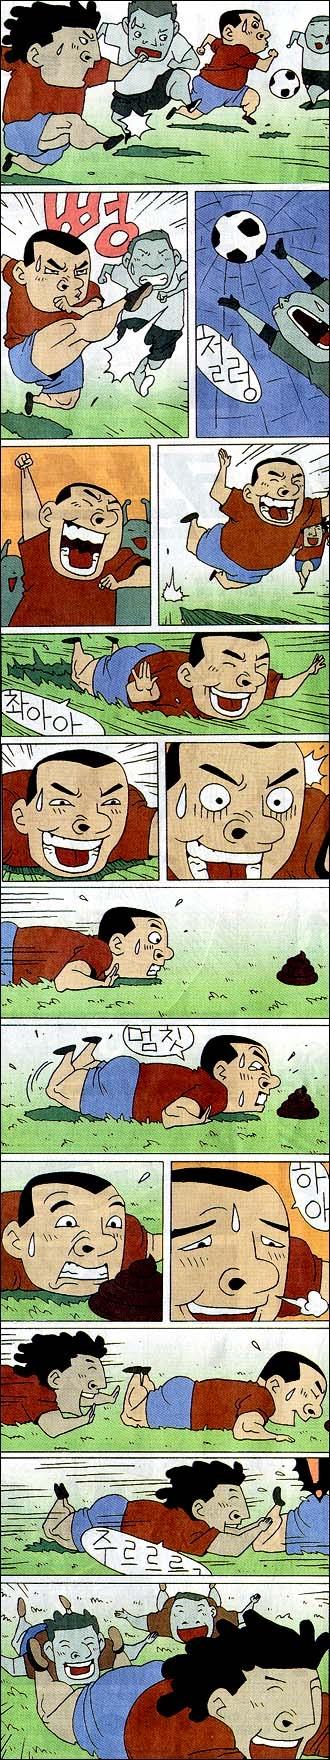 Asaekkiga_Comic_02.jpg